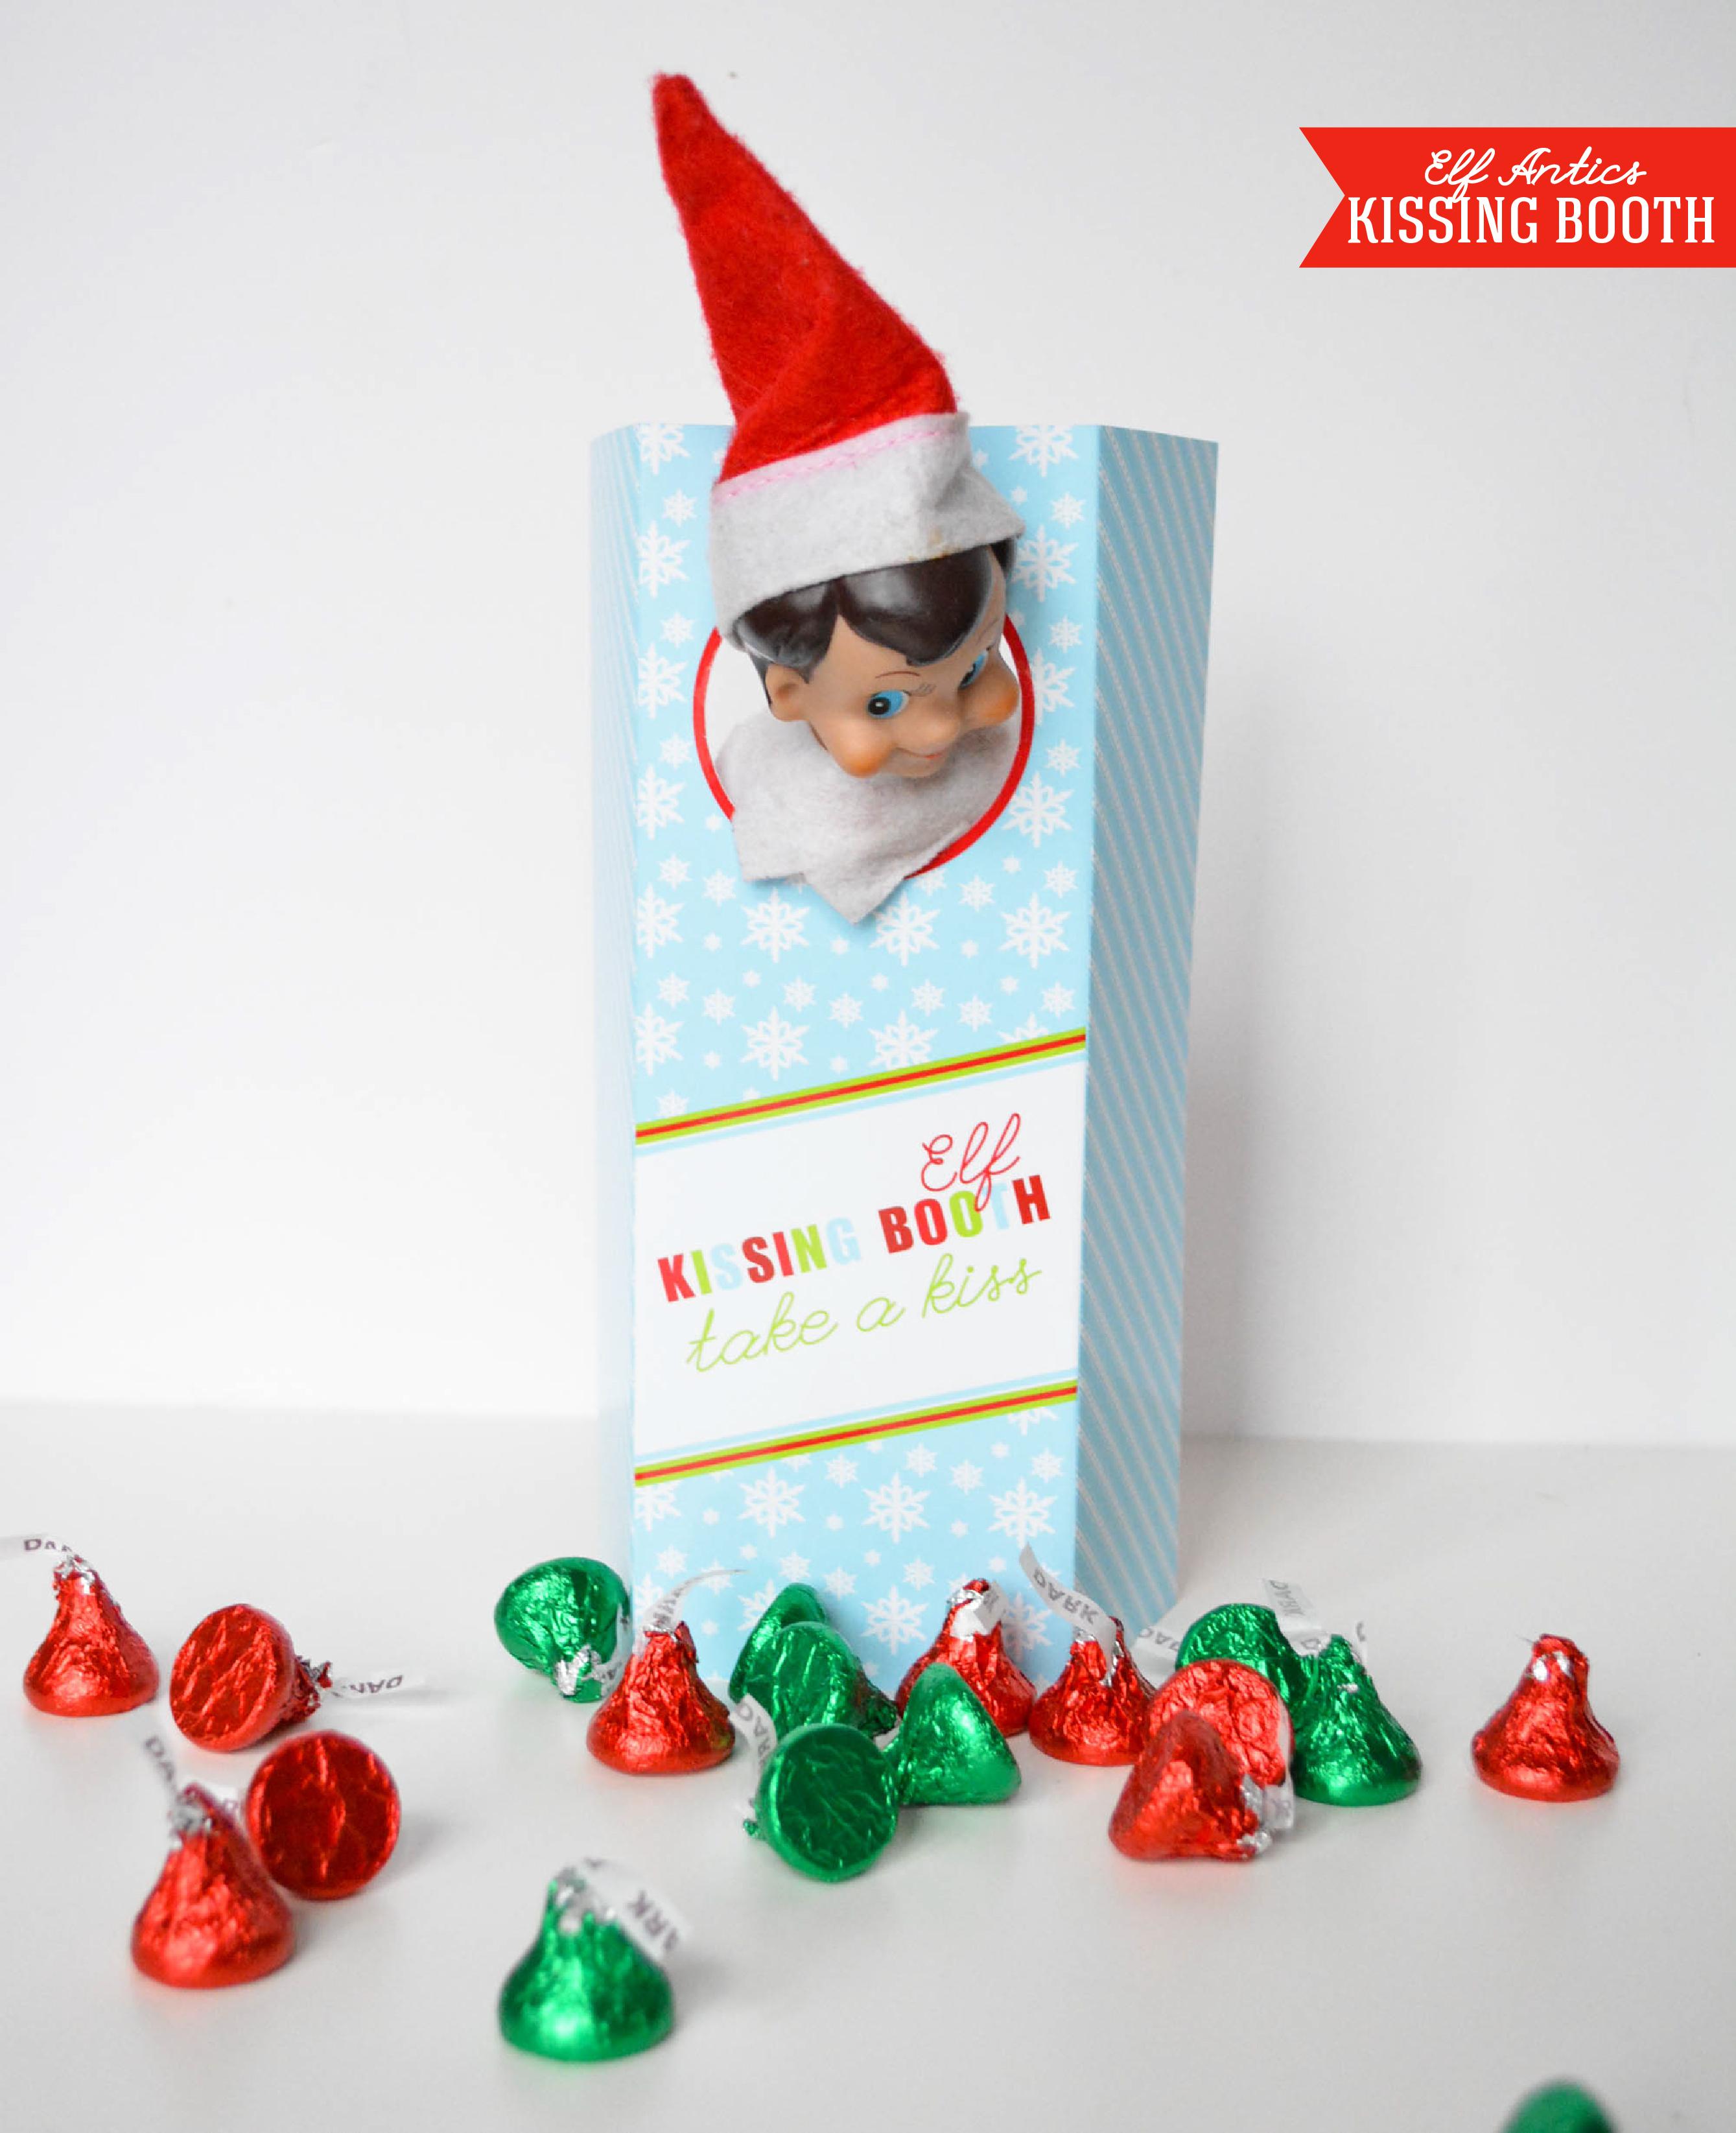 Magical Elf Antics - New To The Shop - Anders Ruff Custom Designs, Llc - Elf On The Shelf Kissing Booth Free Printable